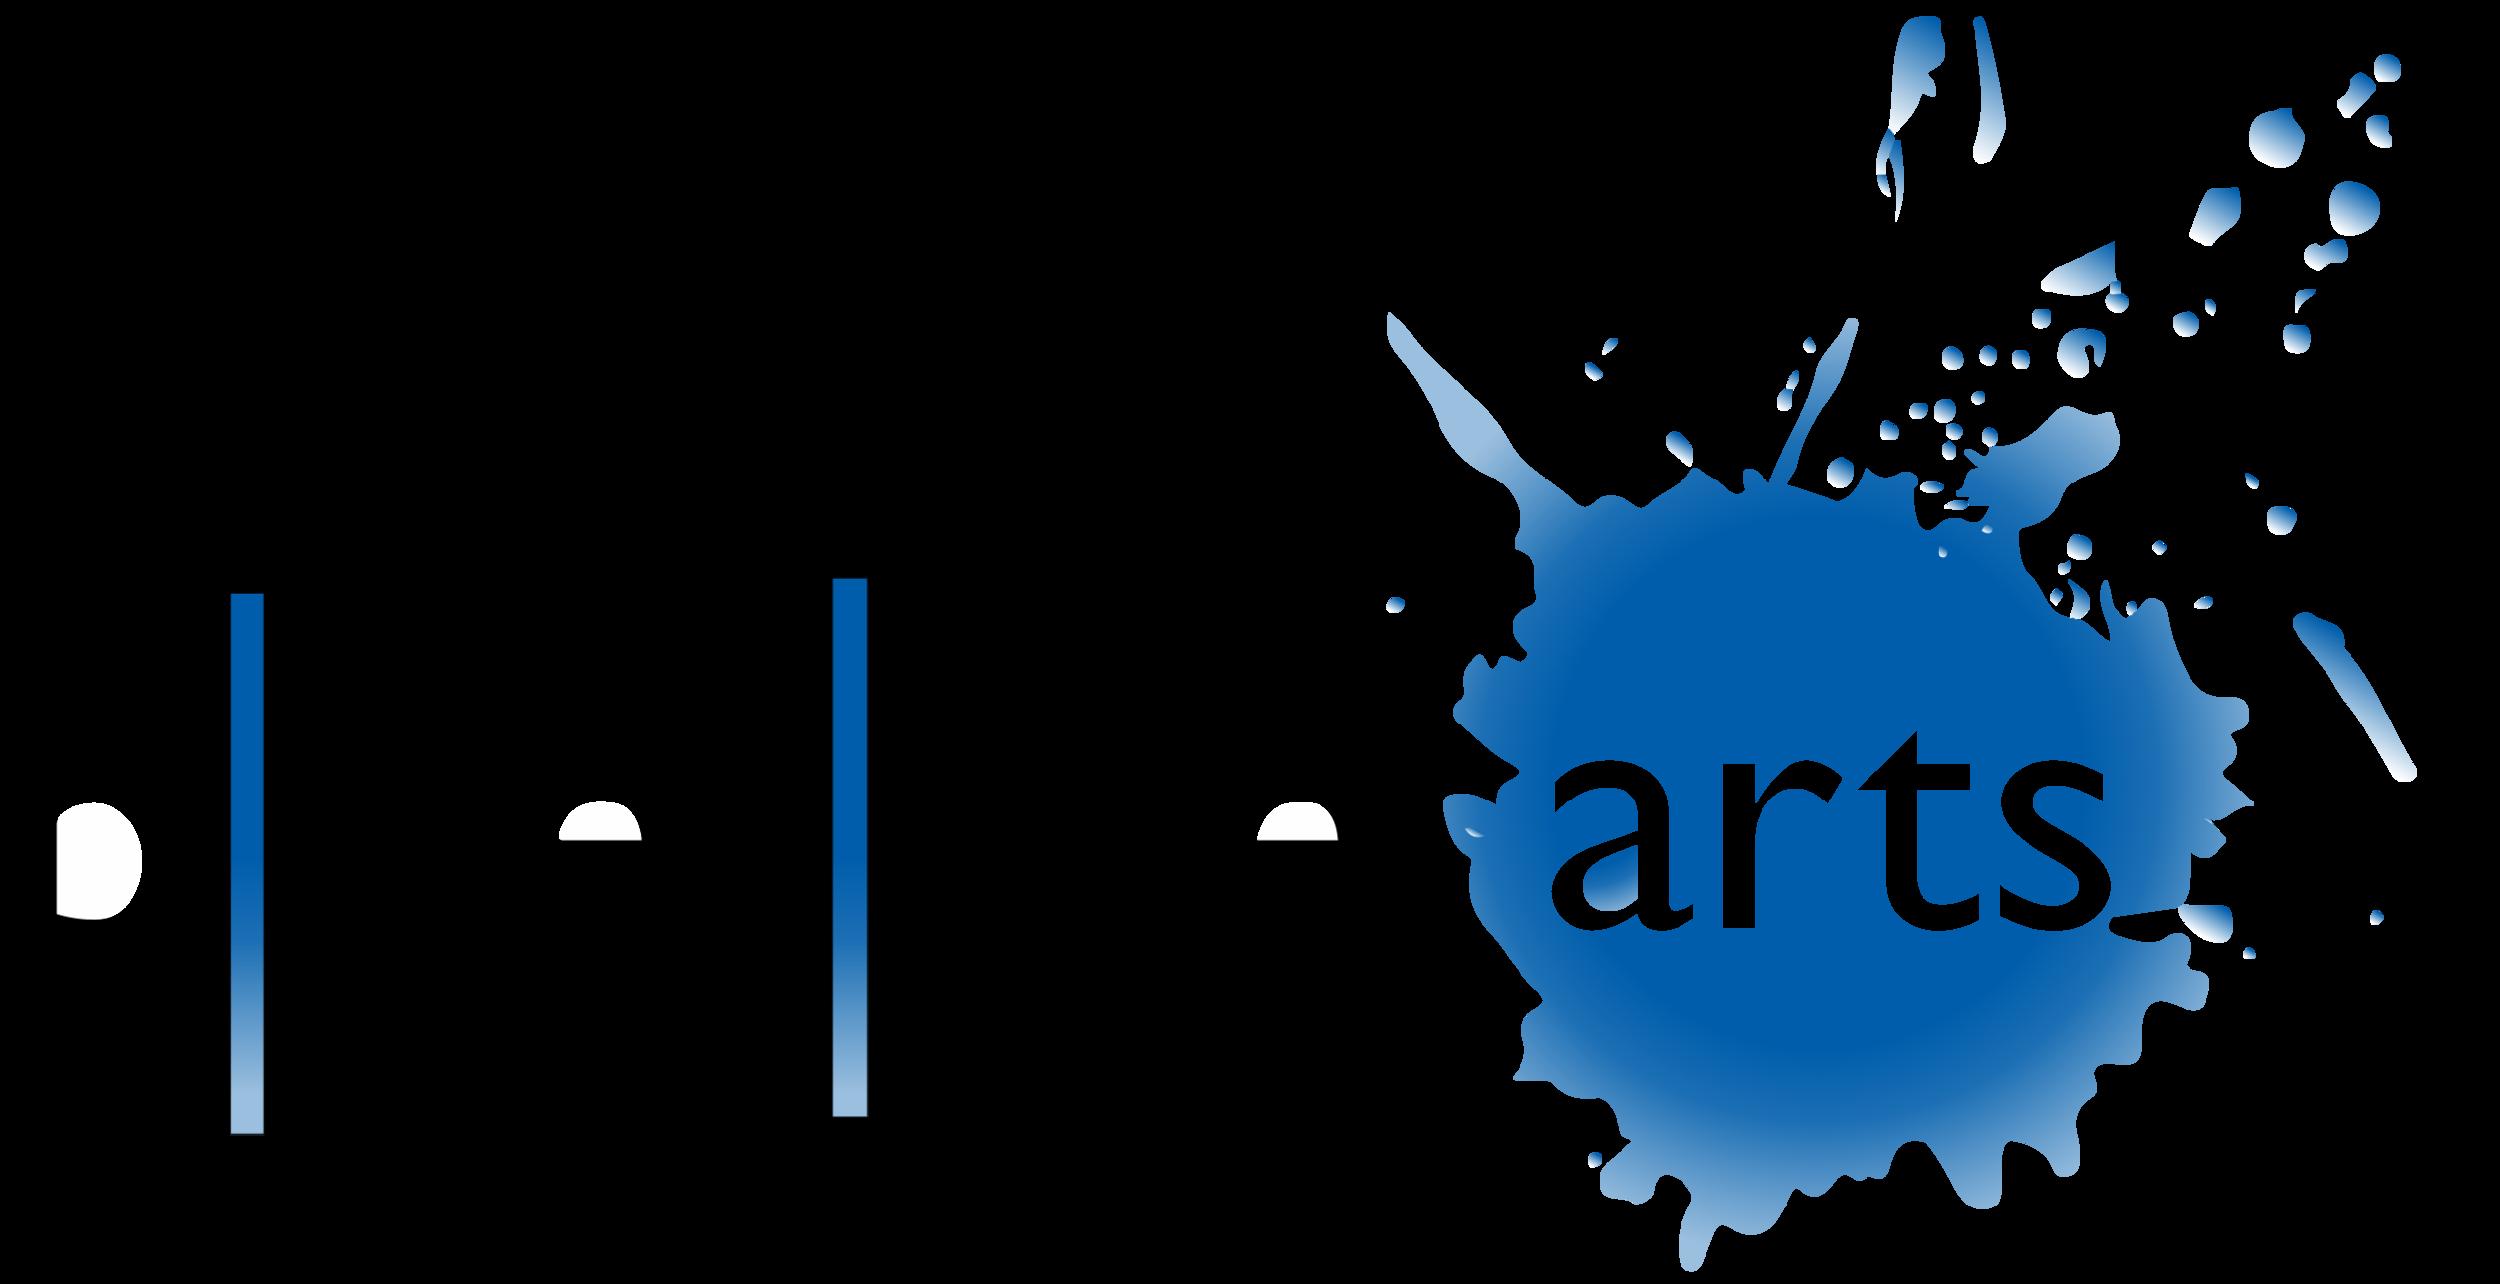 bla-2018-logo-02 (1).png